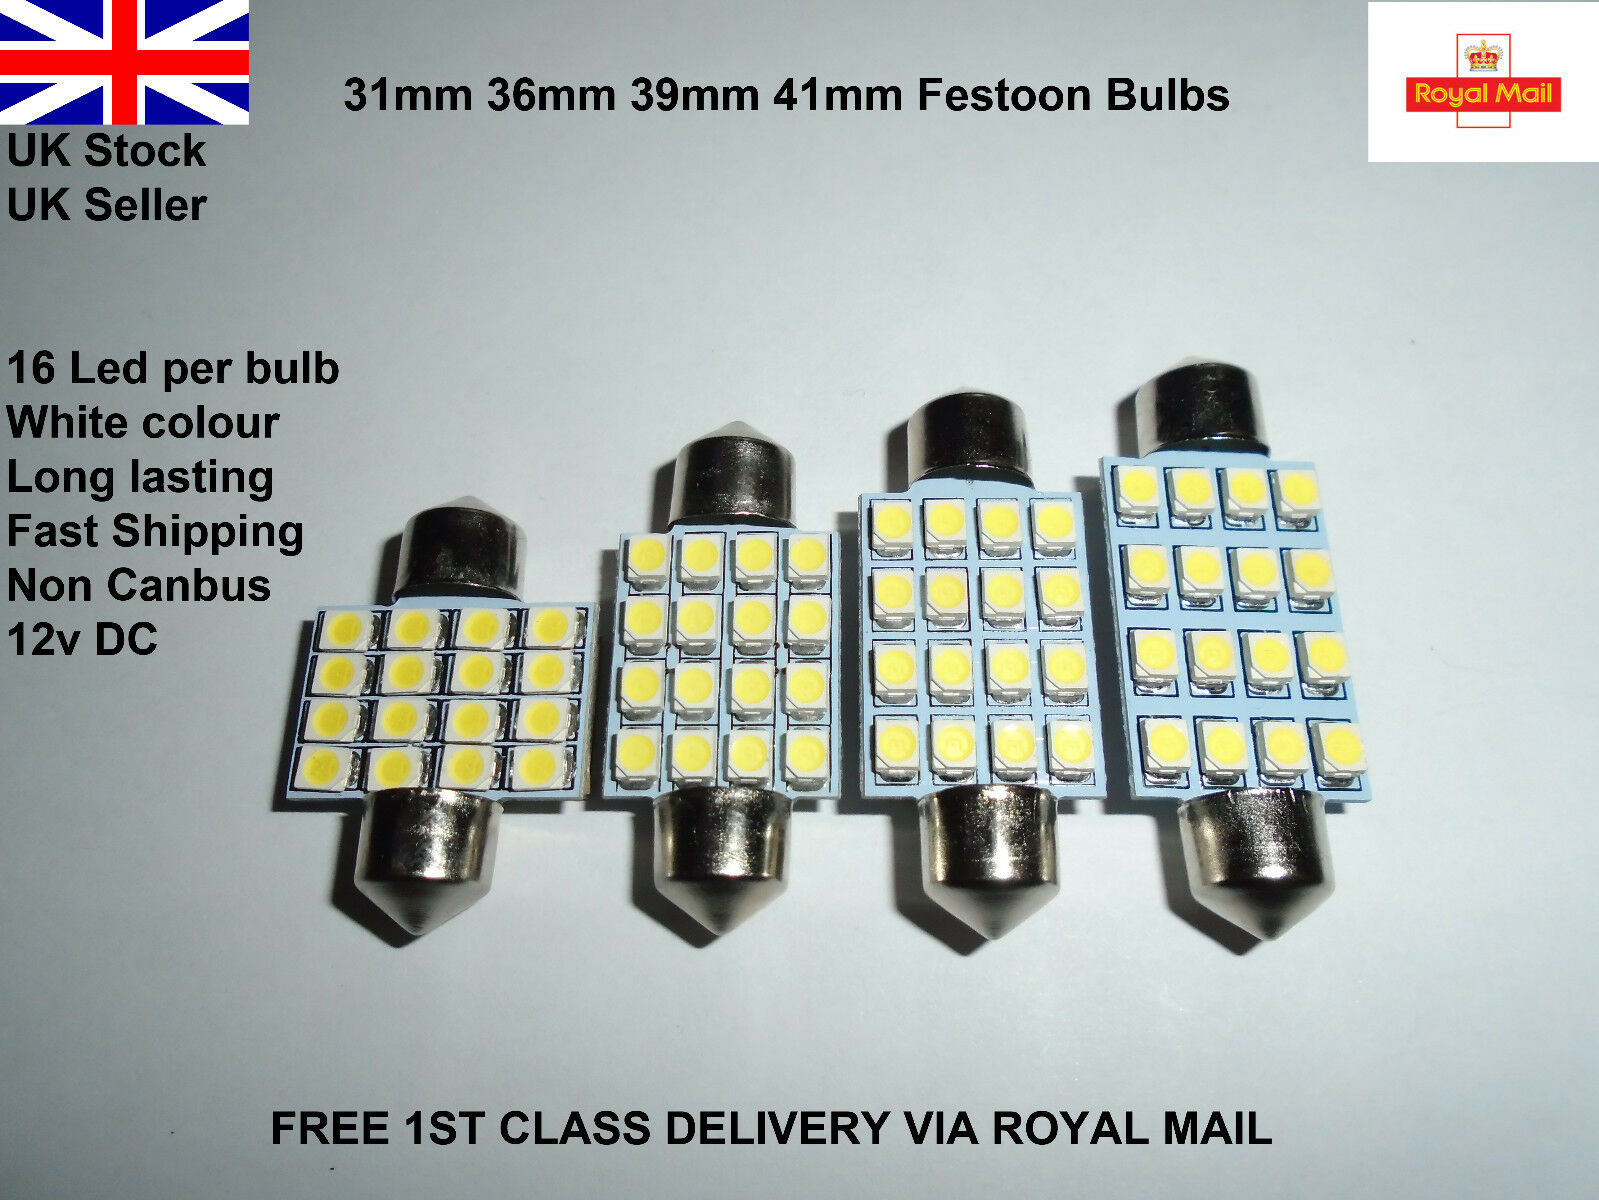 Frosted Ring Automotive RU237 12V 7W 10 X 40 Festoon